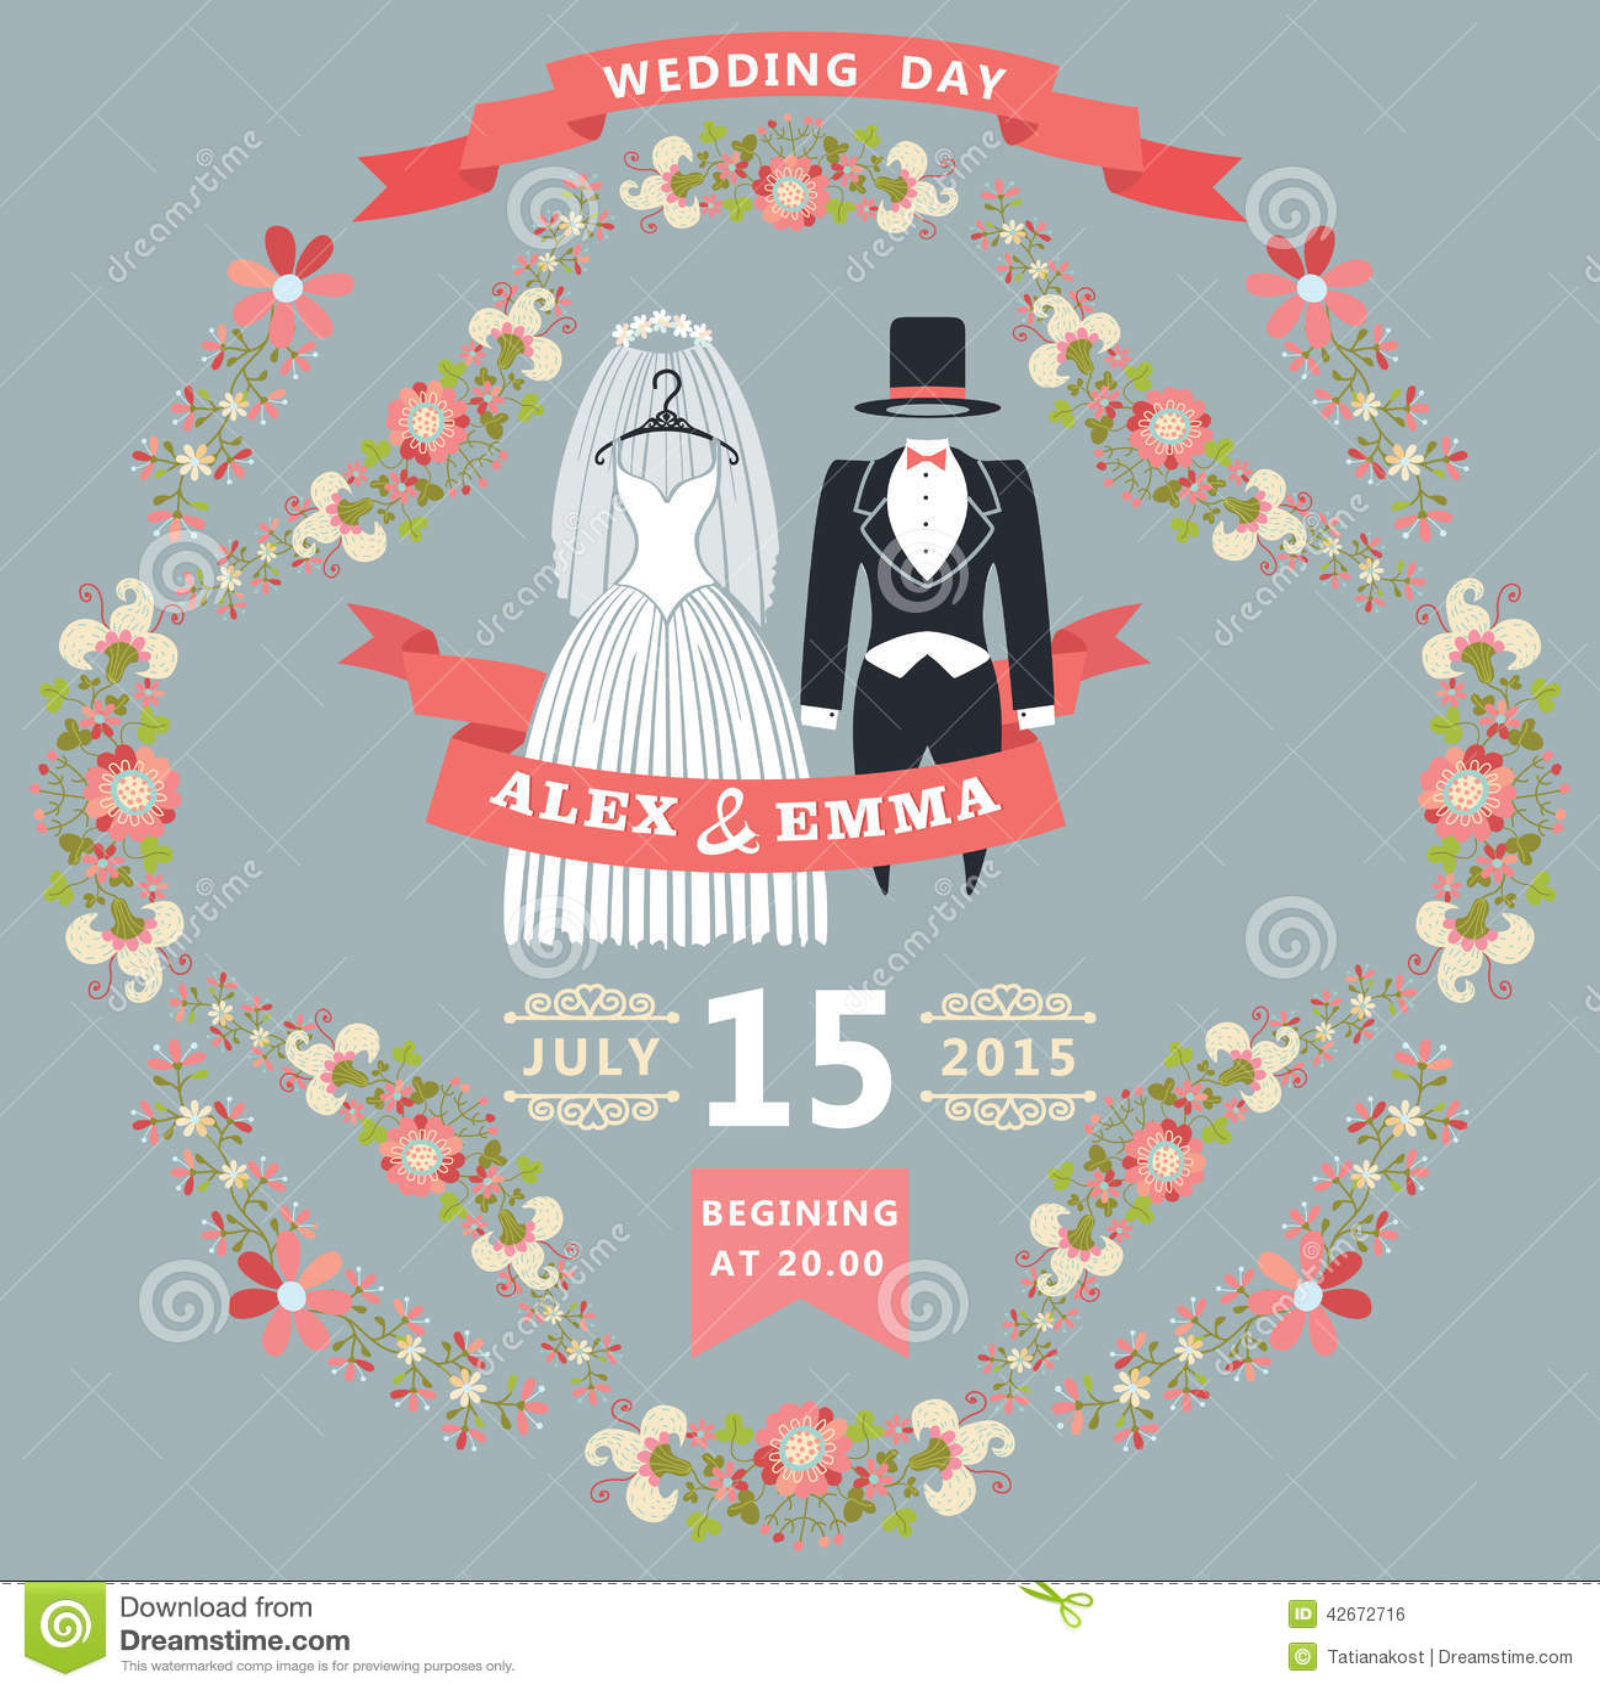 cute wedding invitation with retro wedding wear floral frame stock vector image 42672716. Black Bedroom Furniture Sets. Home Design Ideas